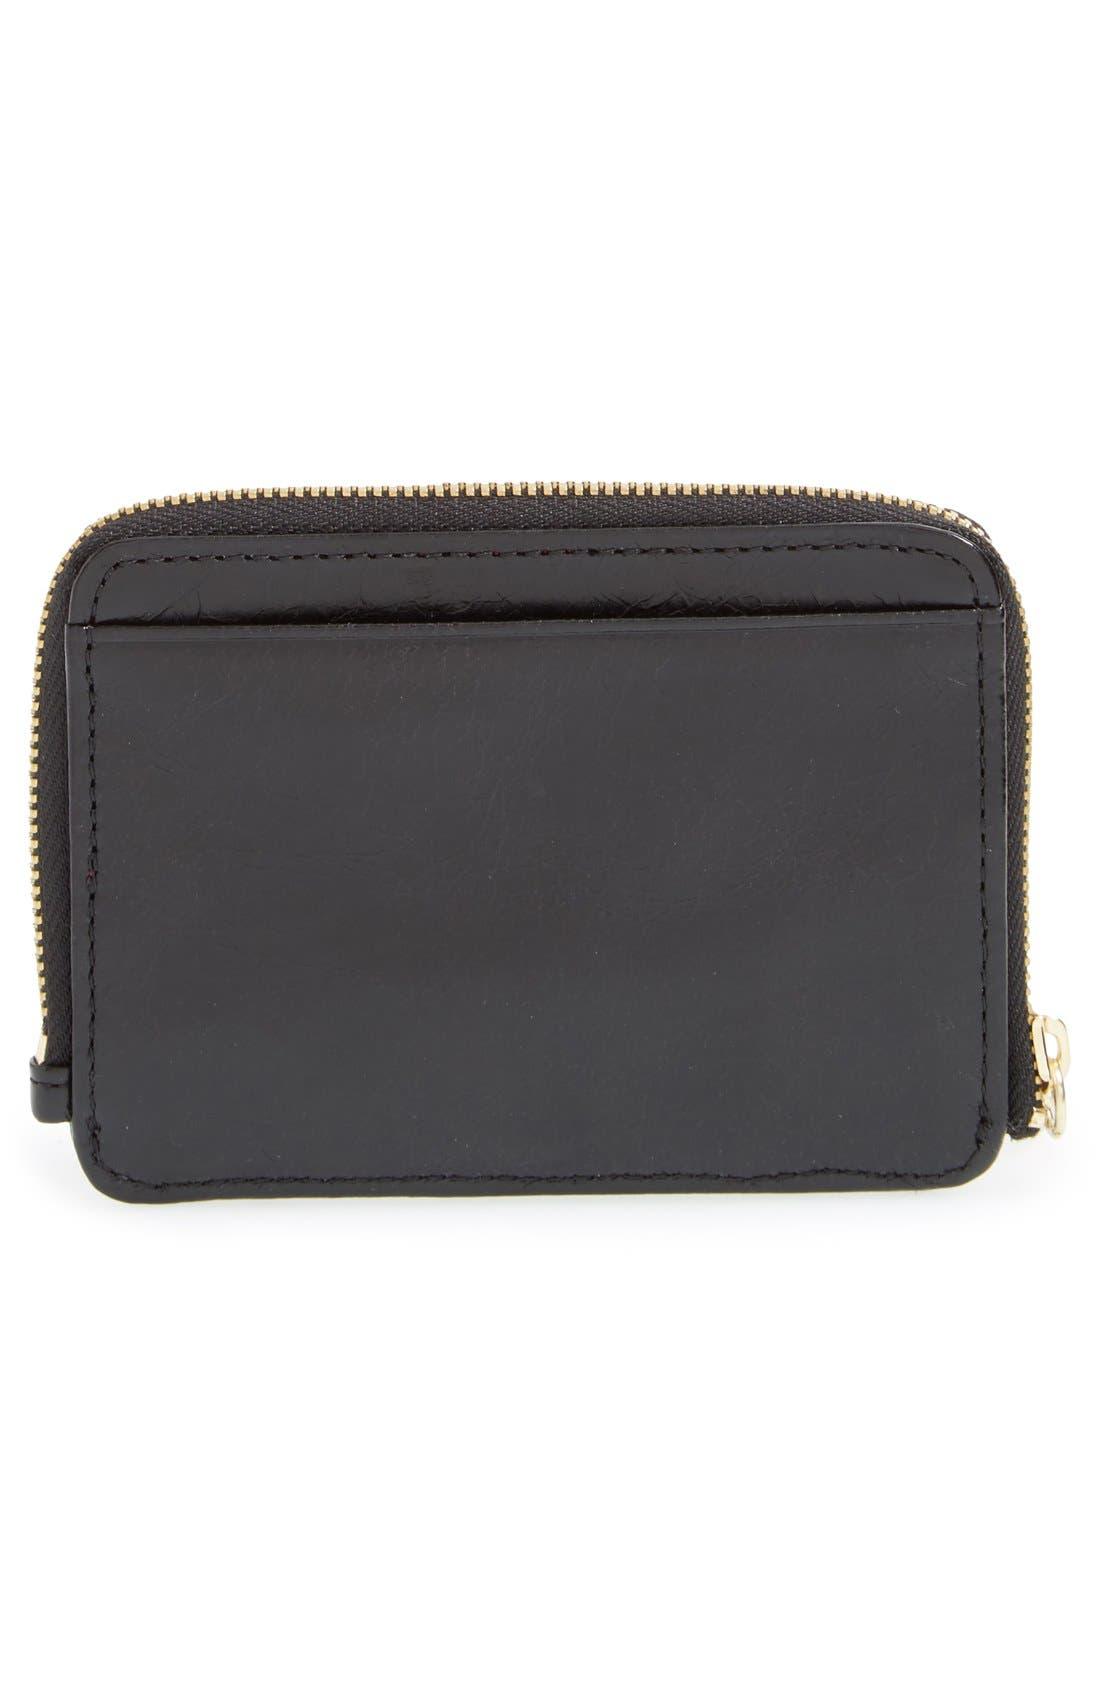 'Katya' Leather Wallet,                             Alternate thumbnail 3, color,                             Black